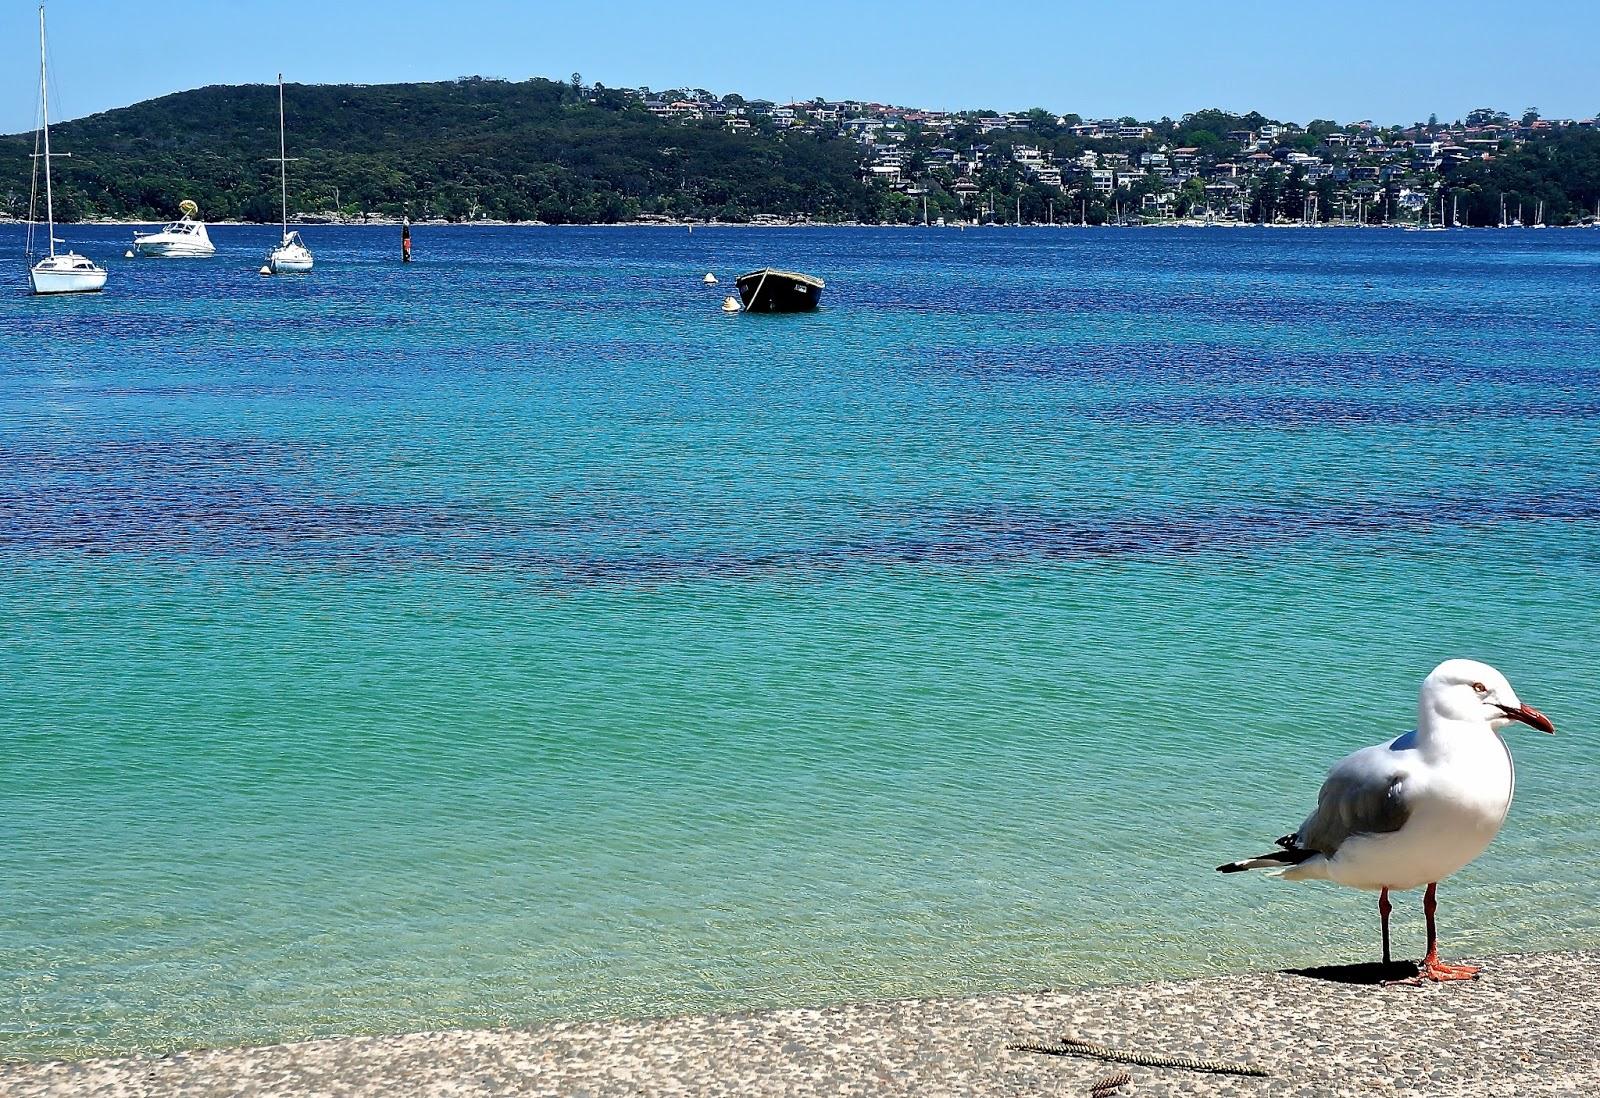 Manly beach Dee Why beach Northern beaches Coastal Walks Ferry Circular Quay Sydney Australia Travel Landscape Lexie blush www.lexieblush.co.uk